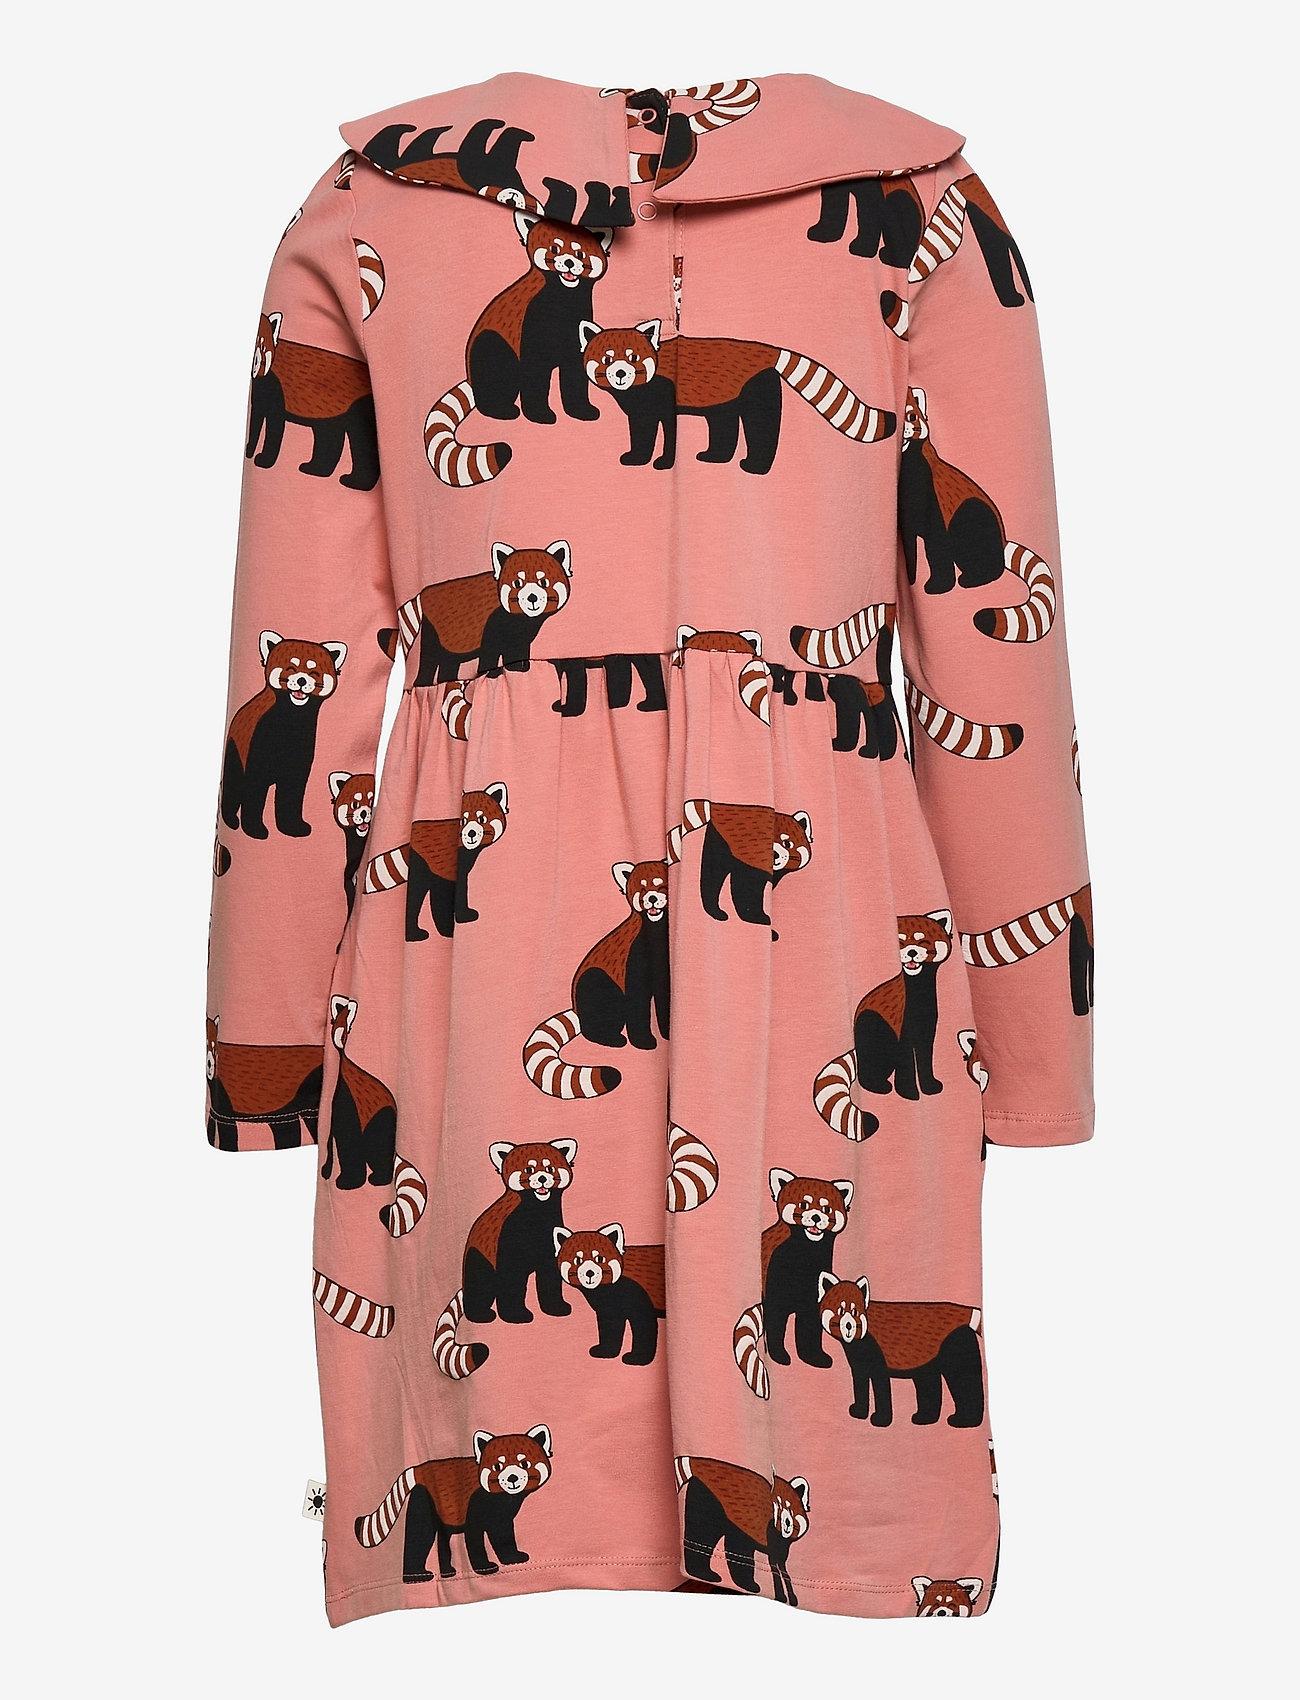 Lindex - Dress Big Collar Red panda aop - kleider - pink - 1